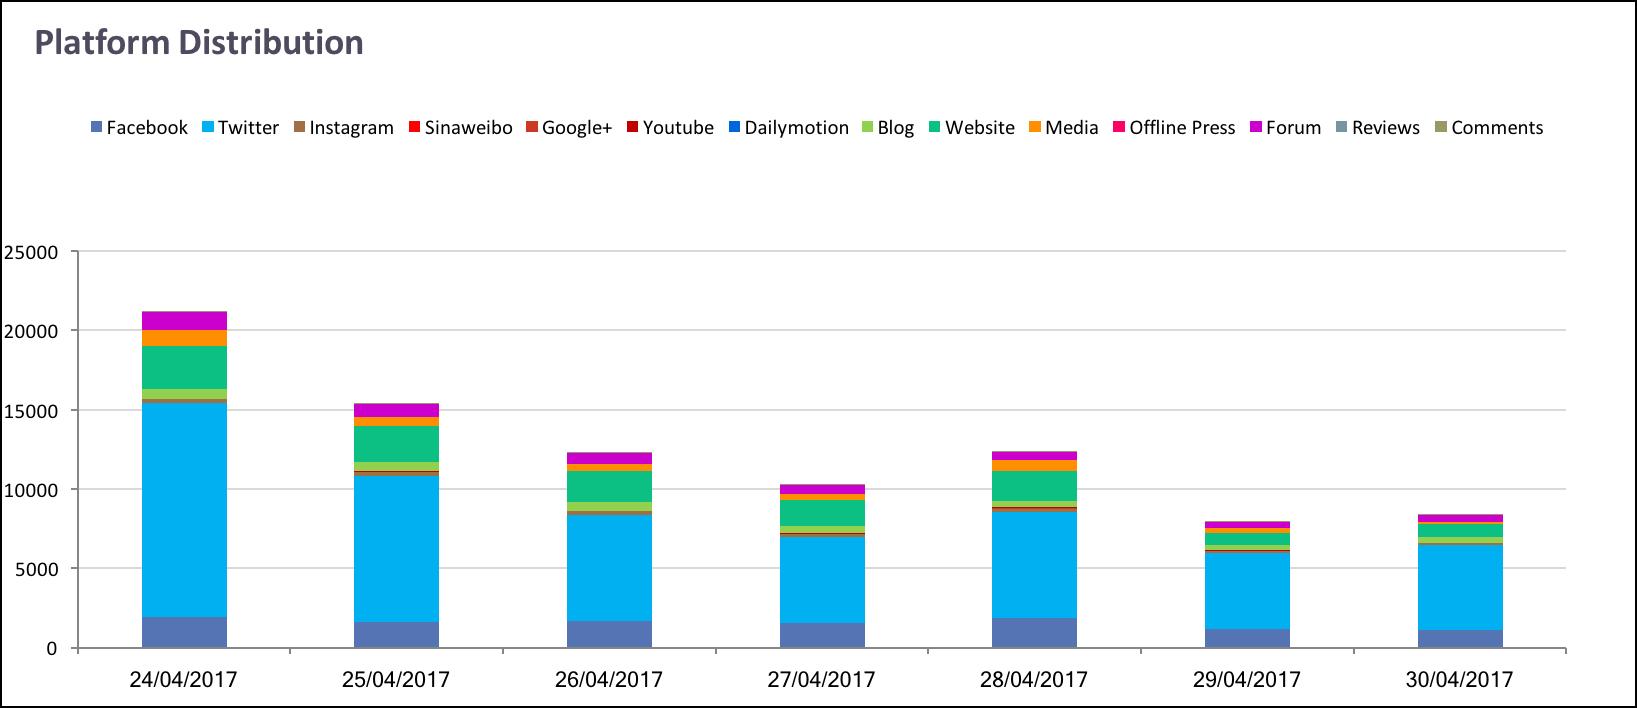 Platform distribution about immunization